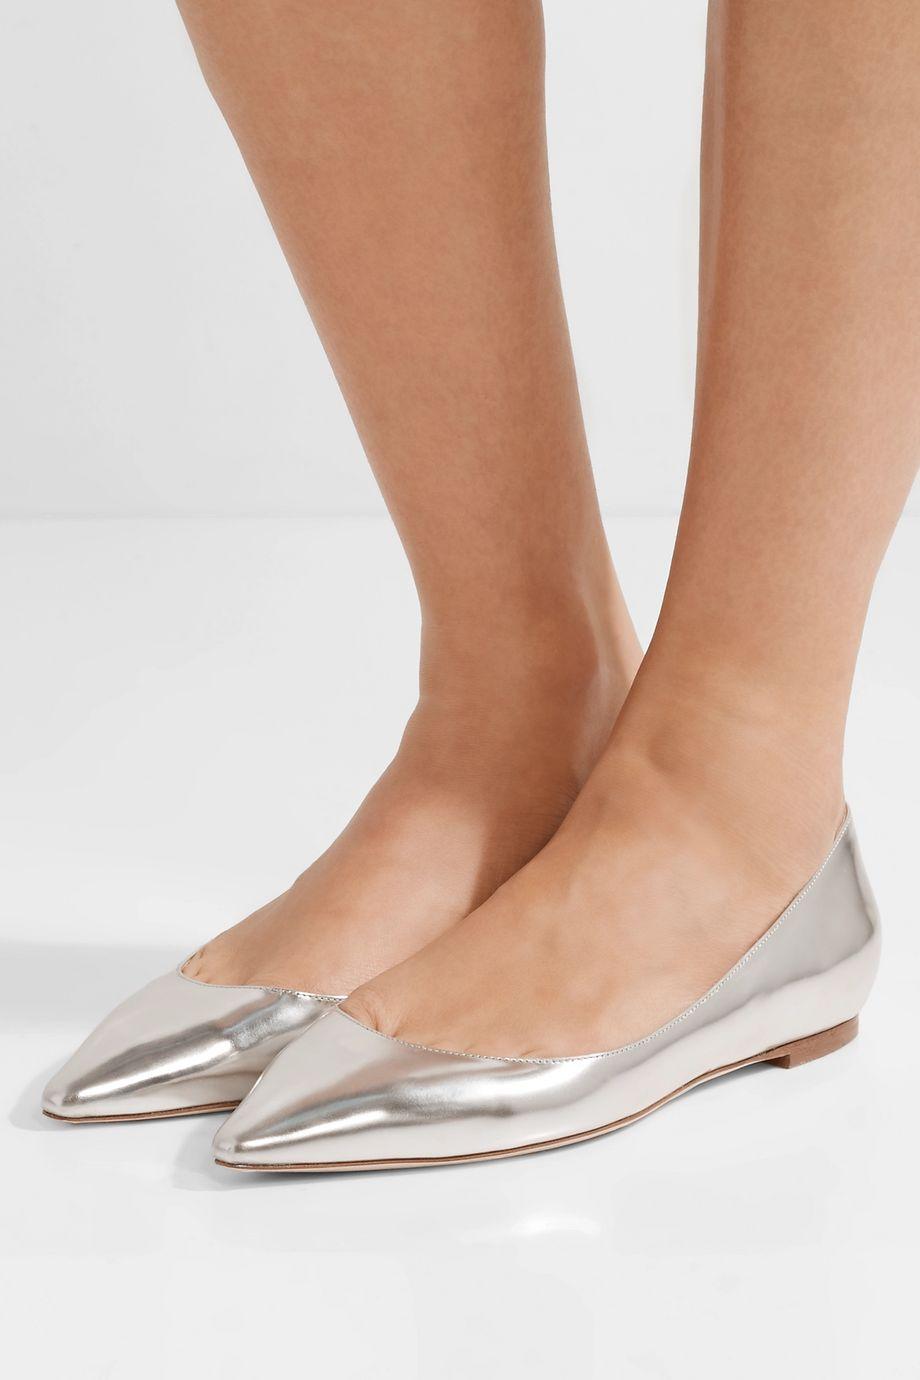 Jimmy Choo Romy metallic leather point-toe flats